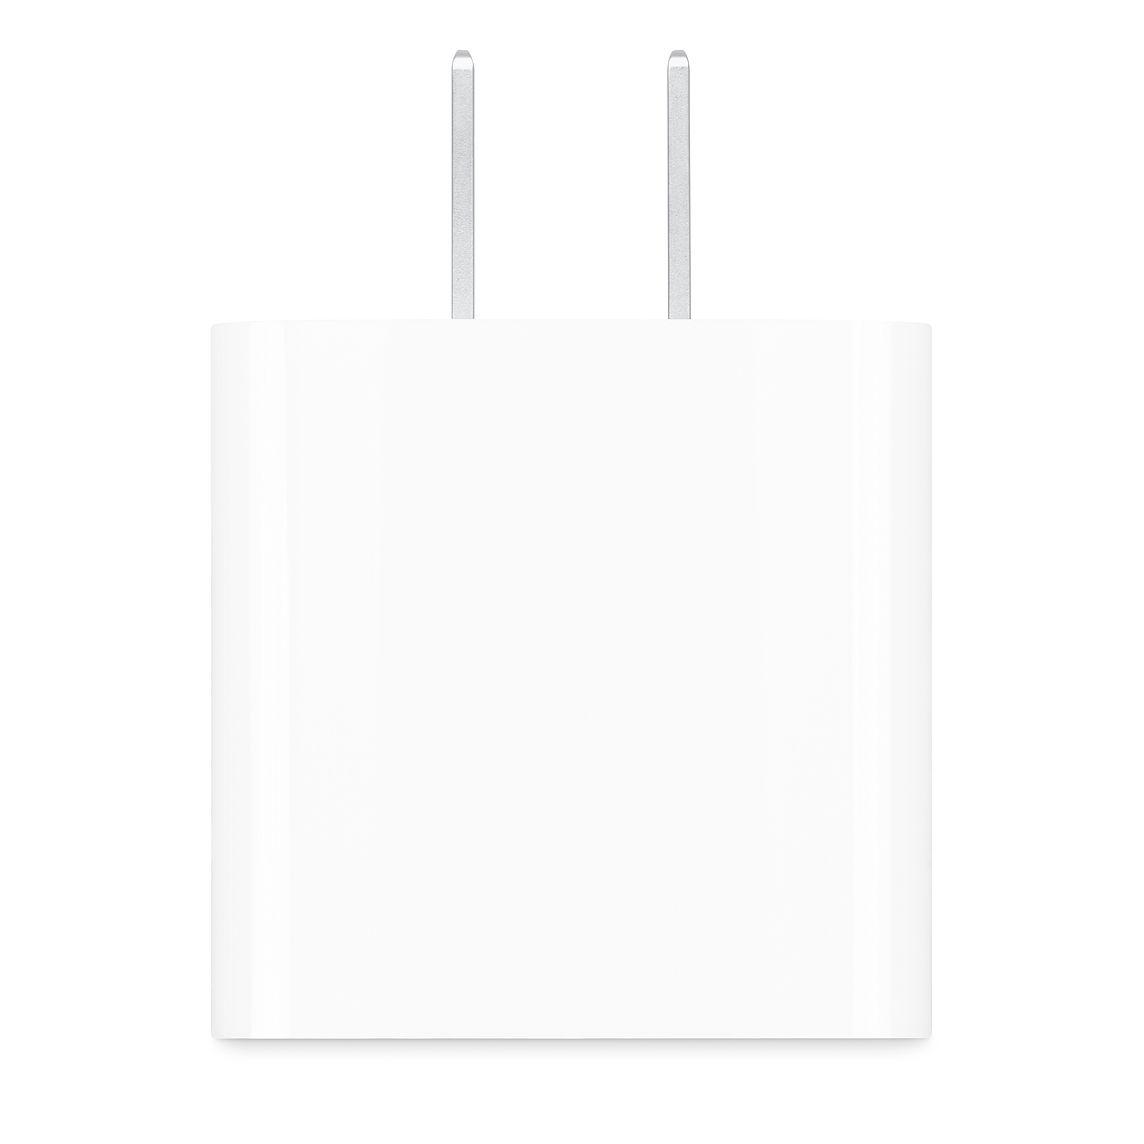 APPLEApple原廠 20W USB-C 電源轉接器 | 預購商品,依原廠到貨時間為準Apple 20W USB‑C 電源轉接器讓你無論在家中、辦公室或外出時,都能快速有效地充電雖然這款電源轉接器與任何配備 USB-C 的裝置相容,但是 Apple 建議與 iPad Pro 及 iPad Air 搭配使用,以發揮最佳充電效能你也可以搭配 iPhone 8 或後續機型使用,以充分發揮其快速充電功能充電連接線另售